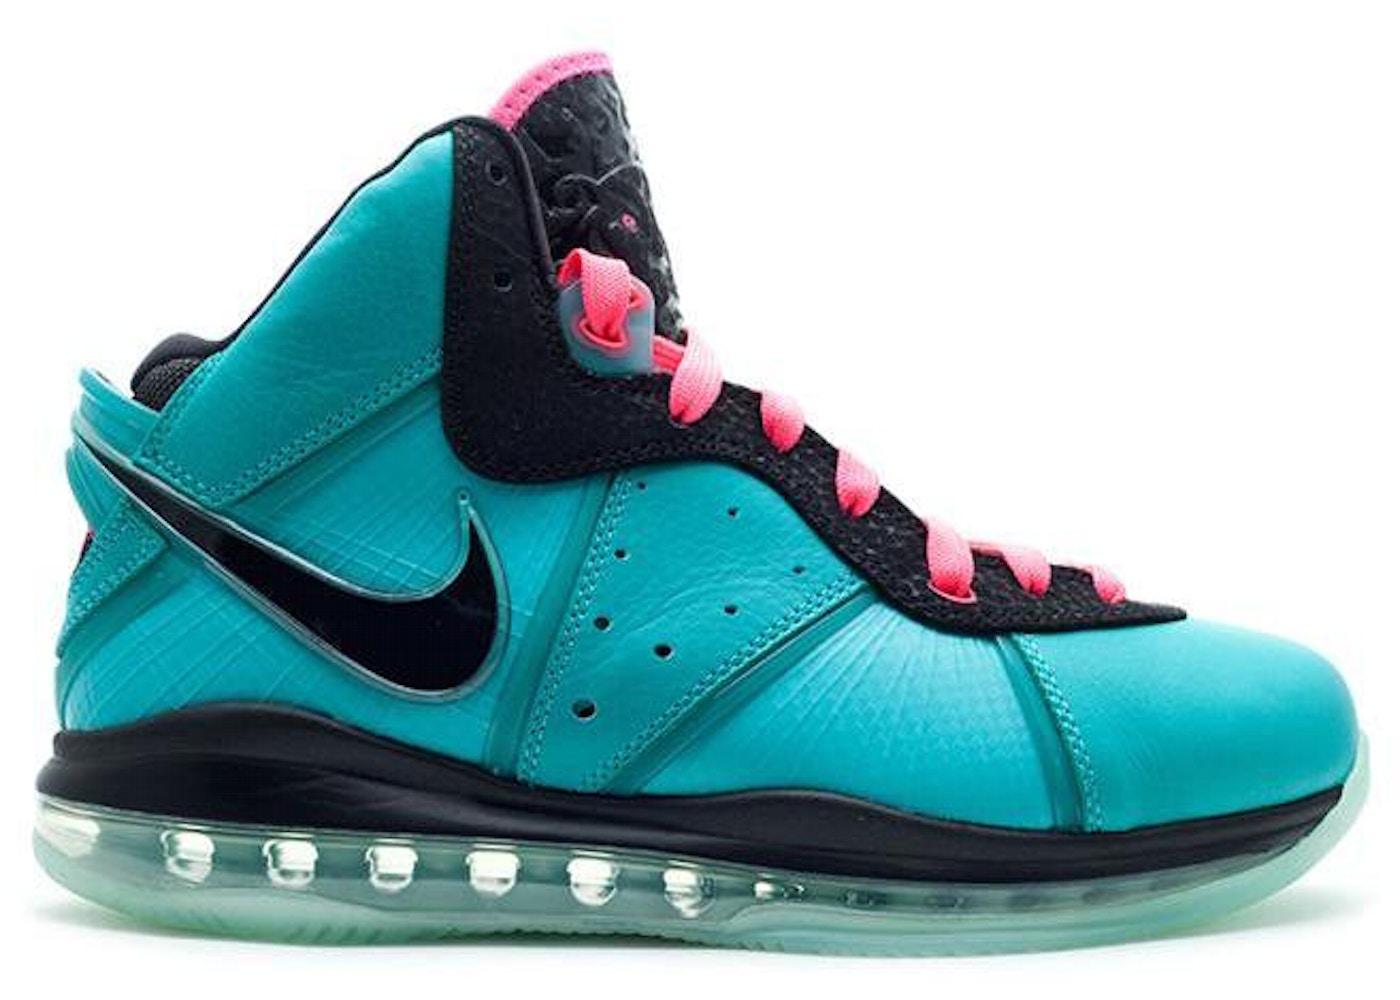 05d6875ff153 Nike LeBron 8 Shoes - Most Popular